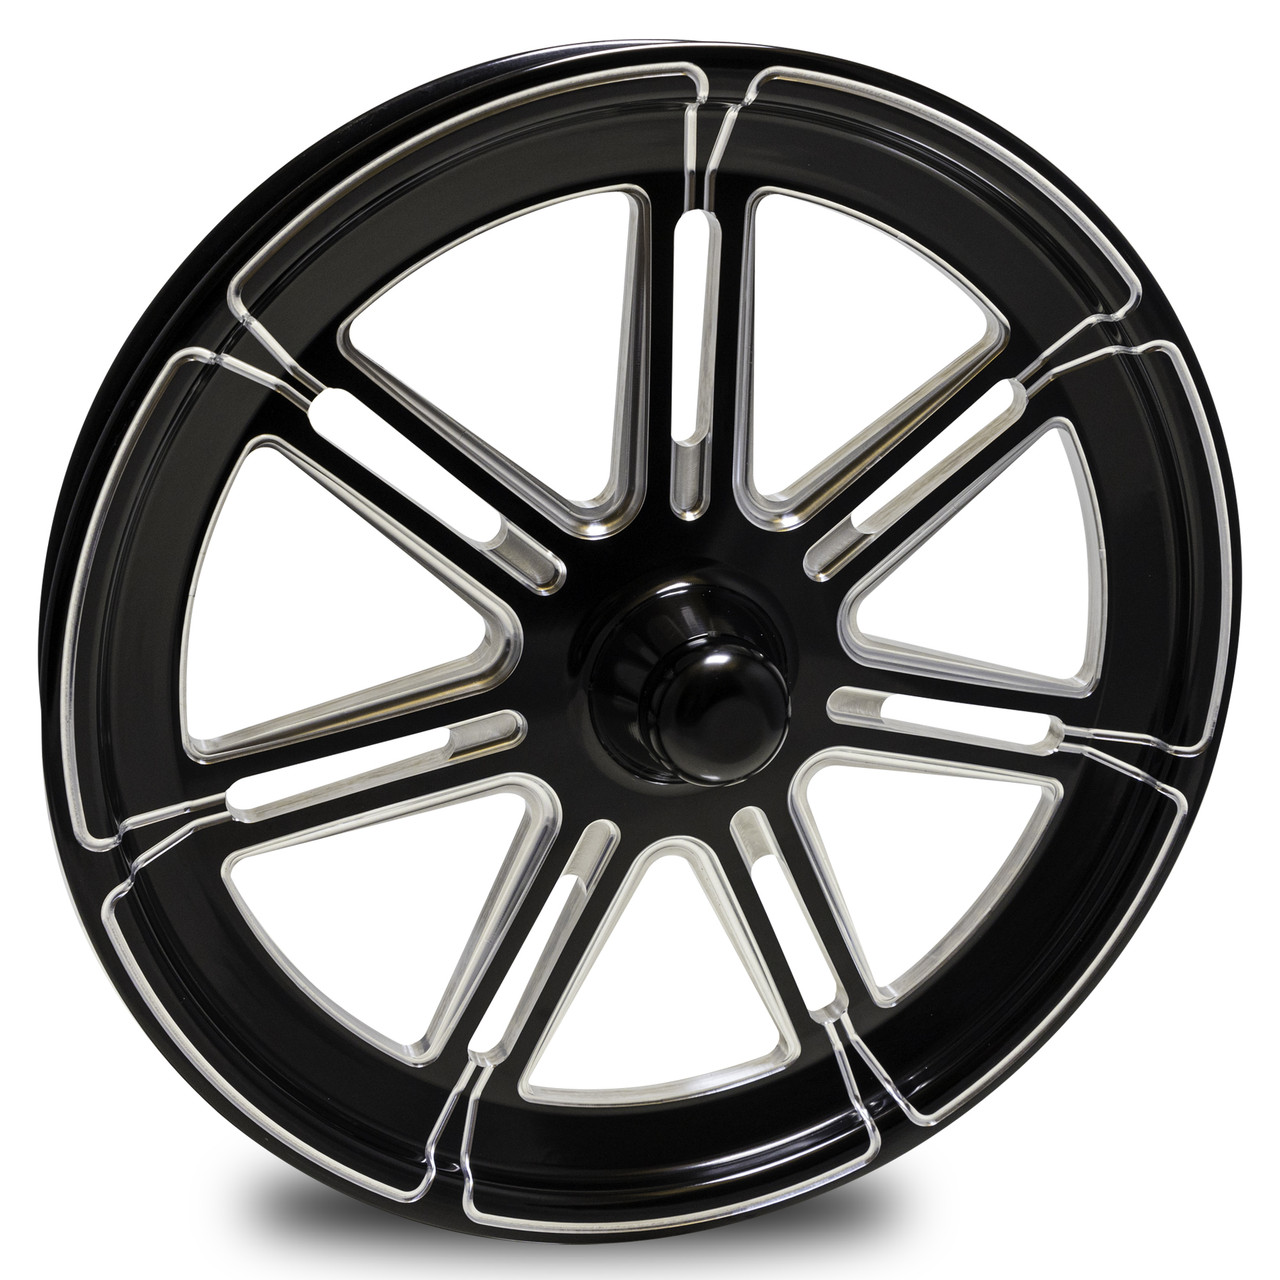 Valor Spindle Mount Dragster Front Drag Racing Wheels